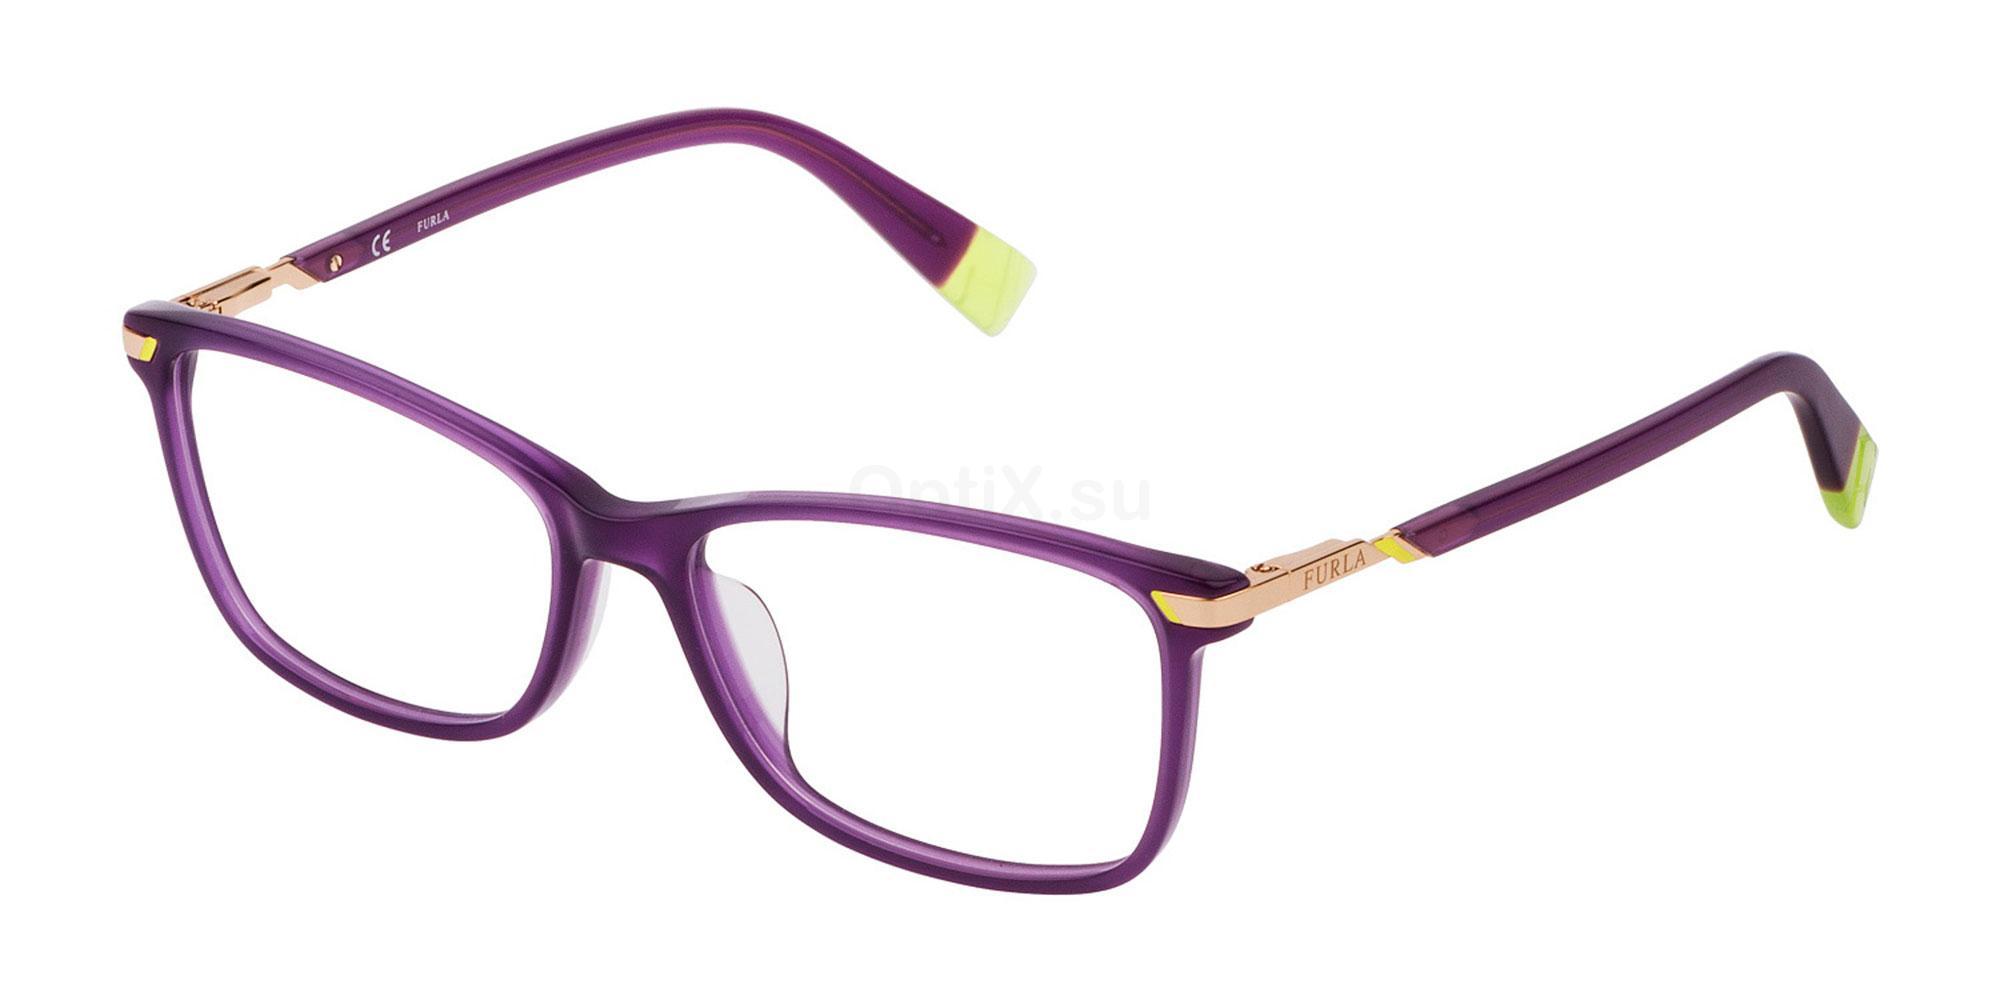 06PJ VFU300 Glasses, Furla